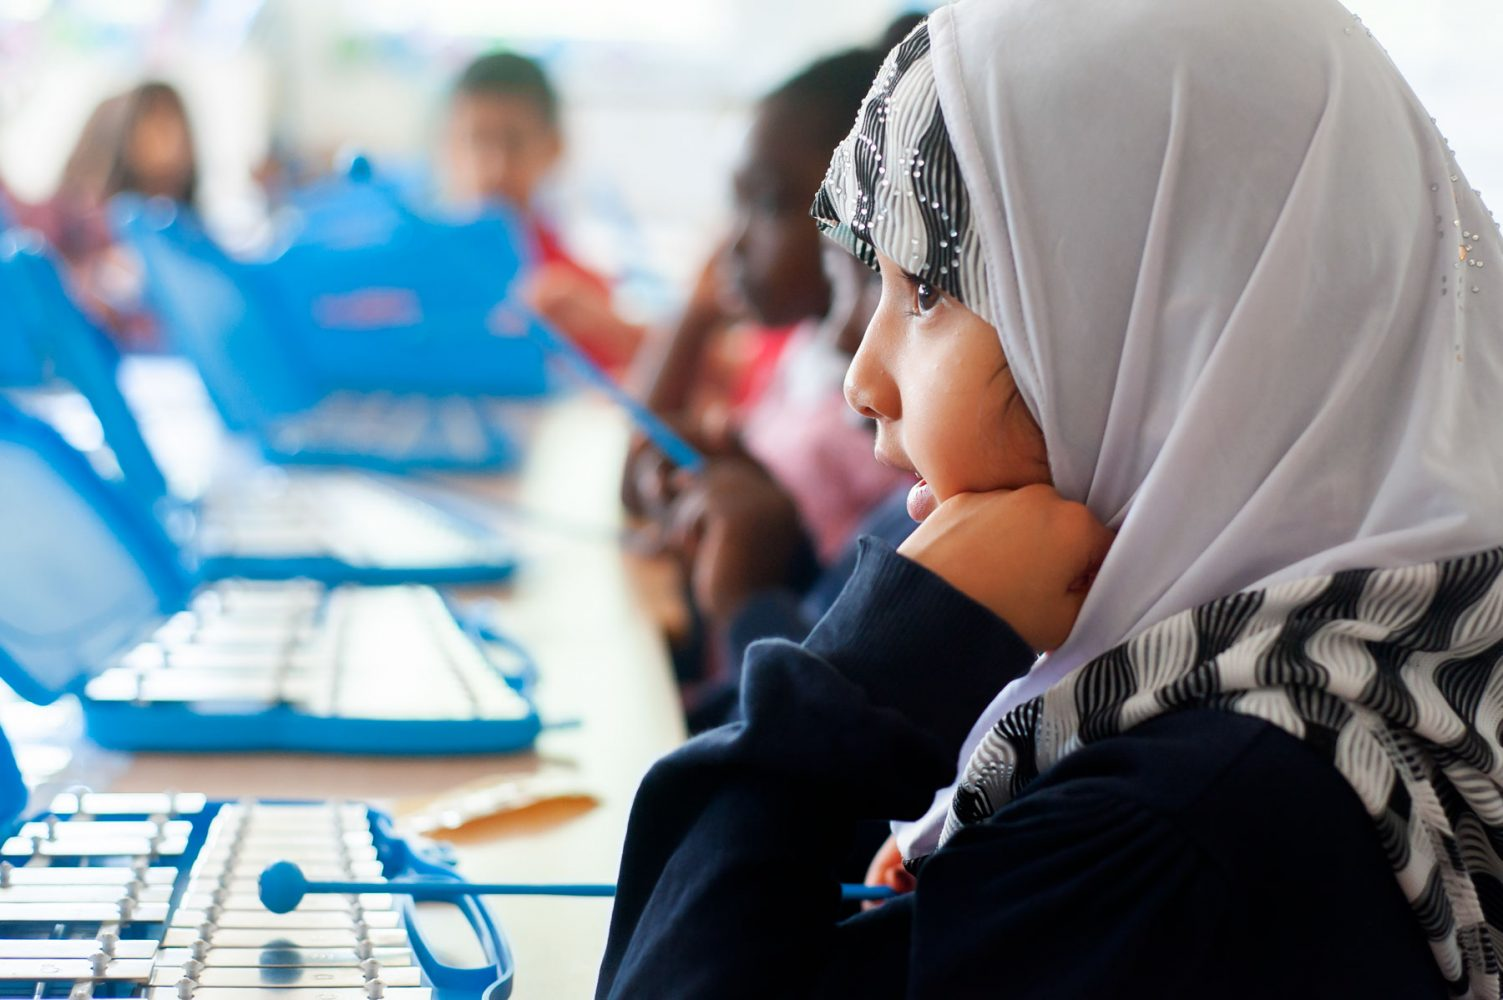 School pupil playing glockenspiel